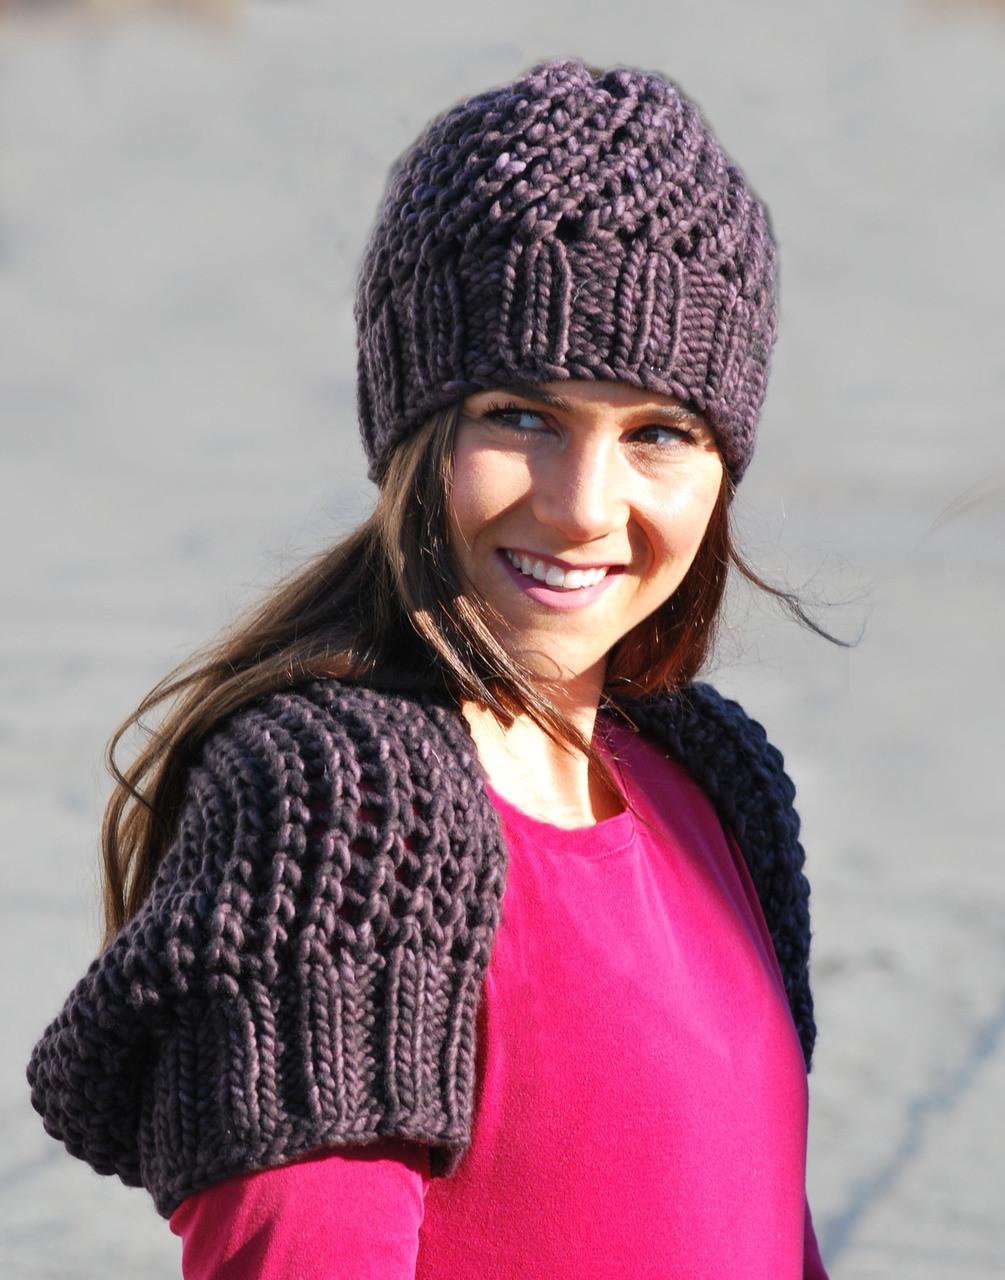 Shrug and Slouchy Beanie - http   www.knittingboard.com  758502ee993